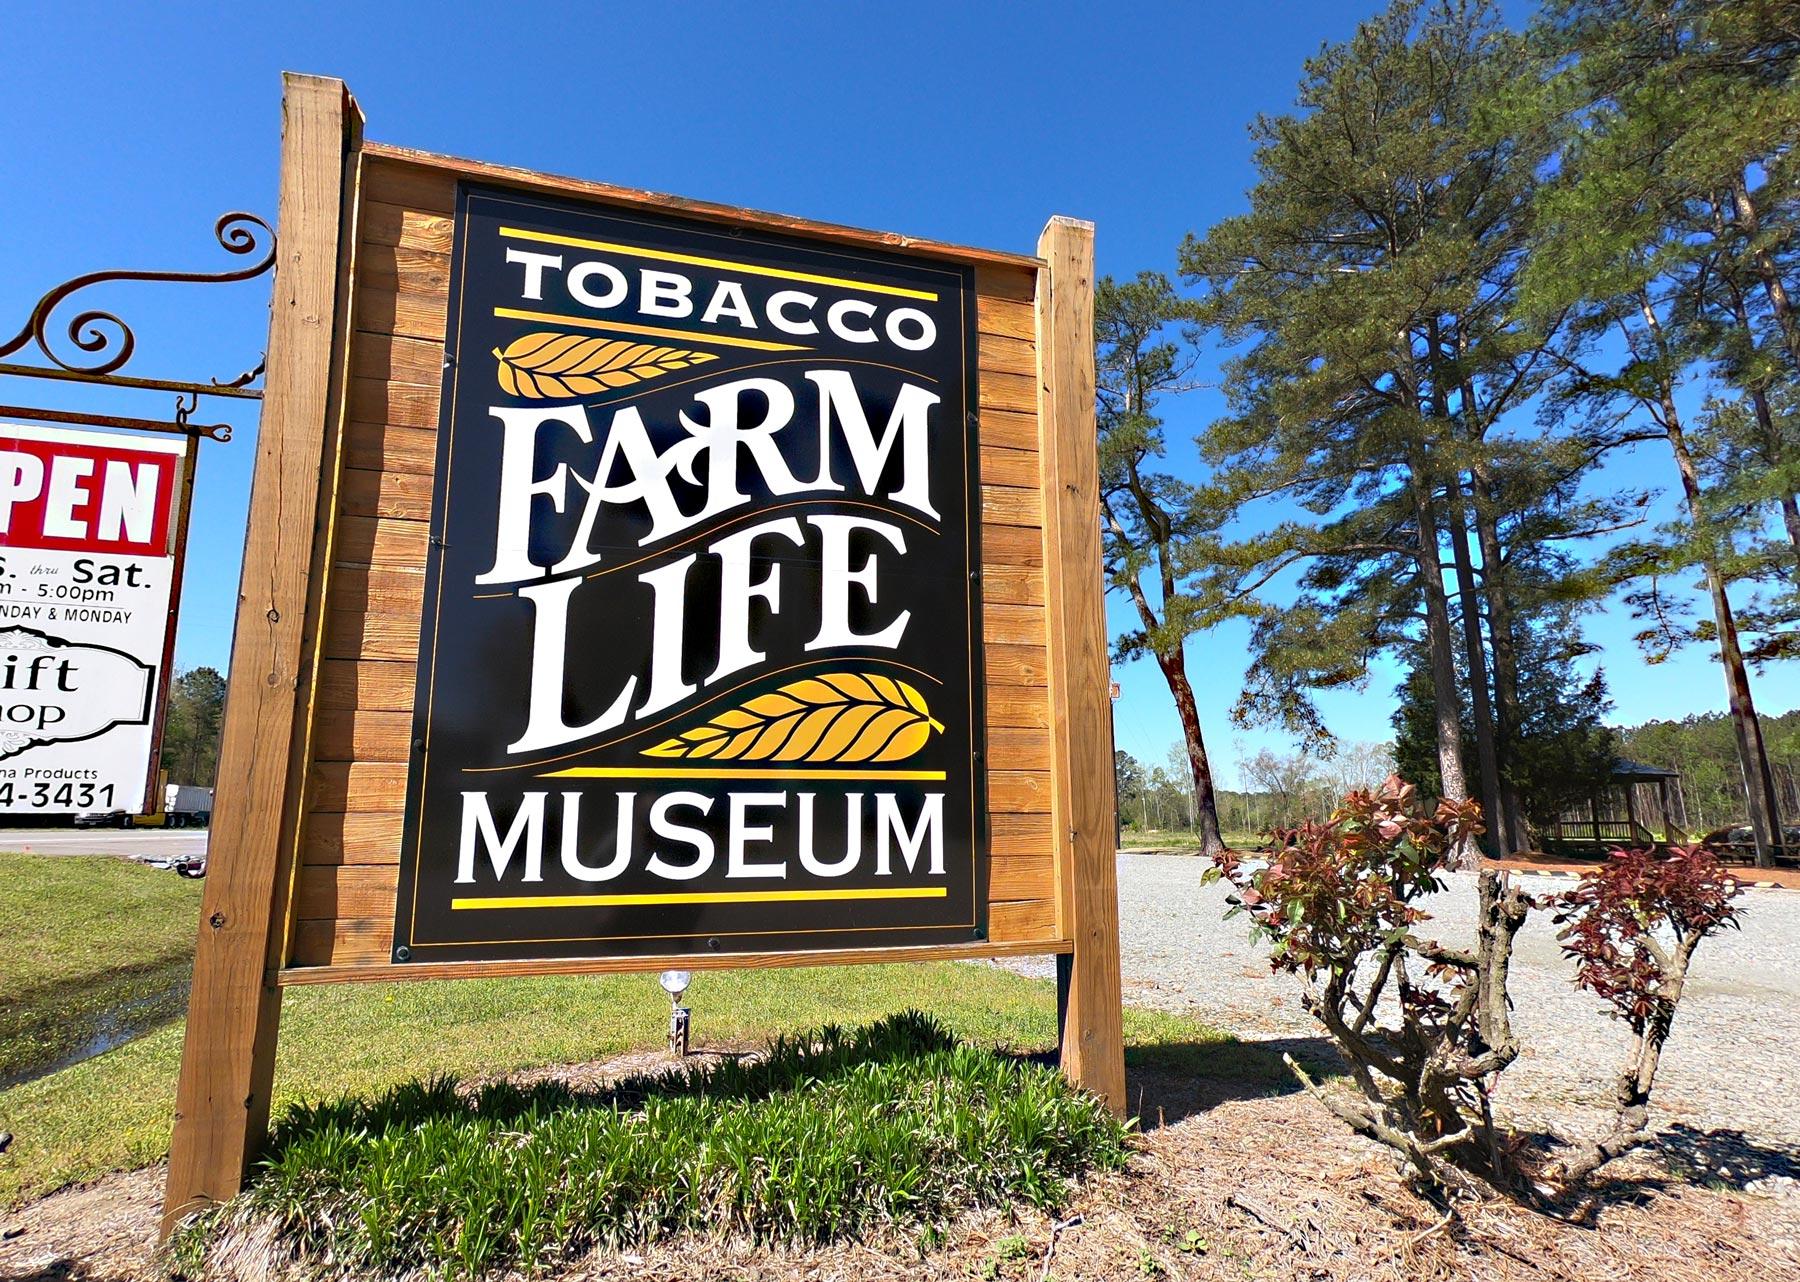 Road entrance signage for Tobacco Farm Life Museum, Kenly, North Carolina